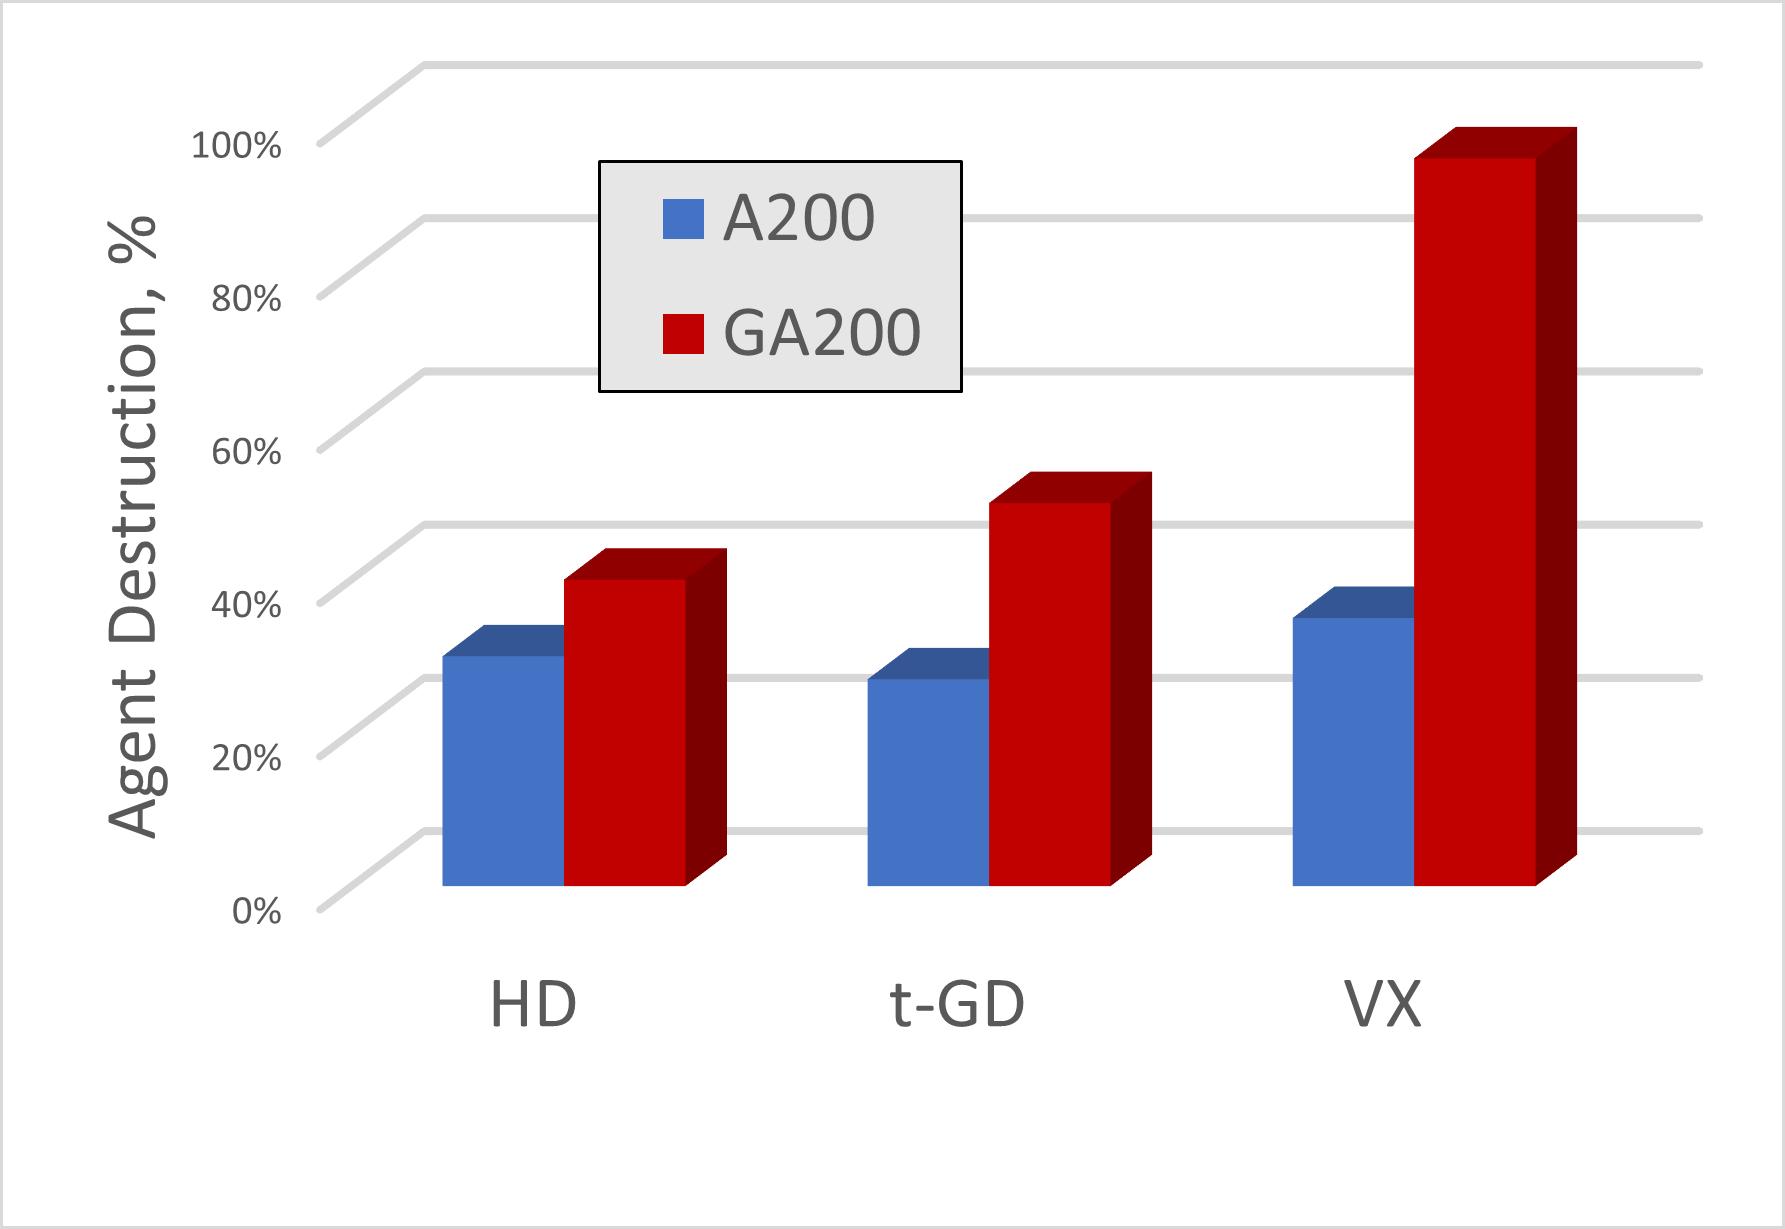 Performance of GA200 Decon Powder exceeds A200 Sorbent Powder